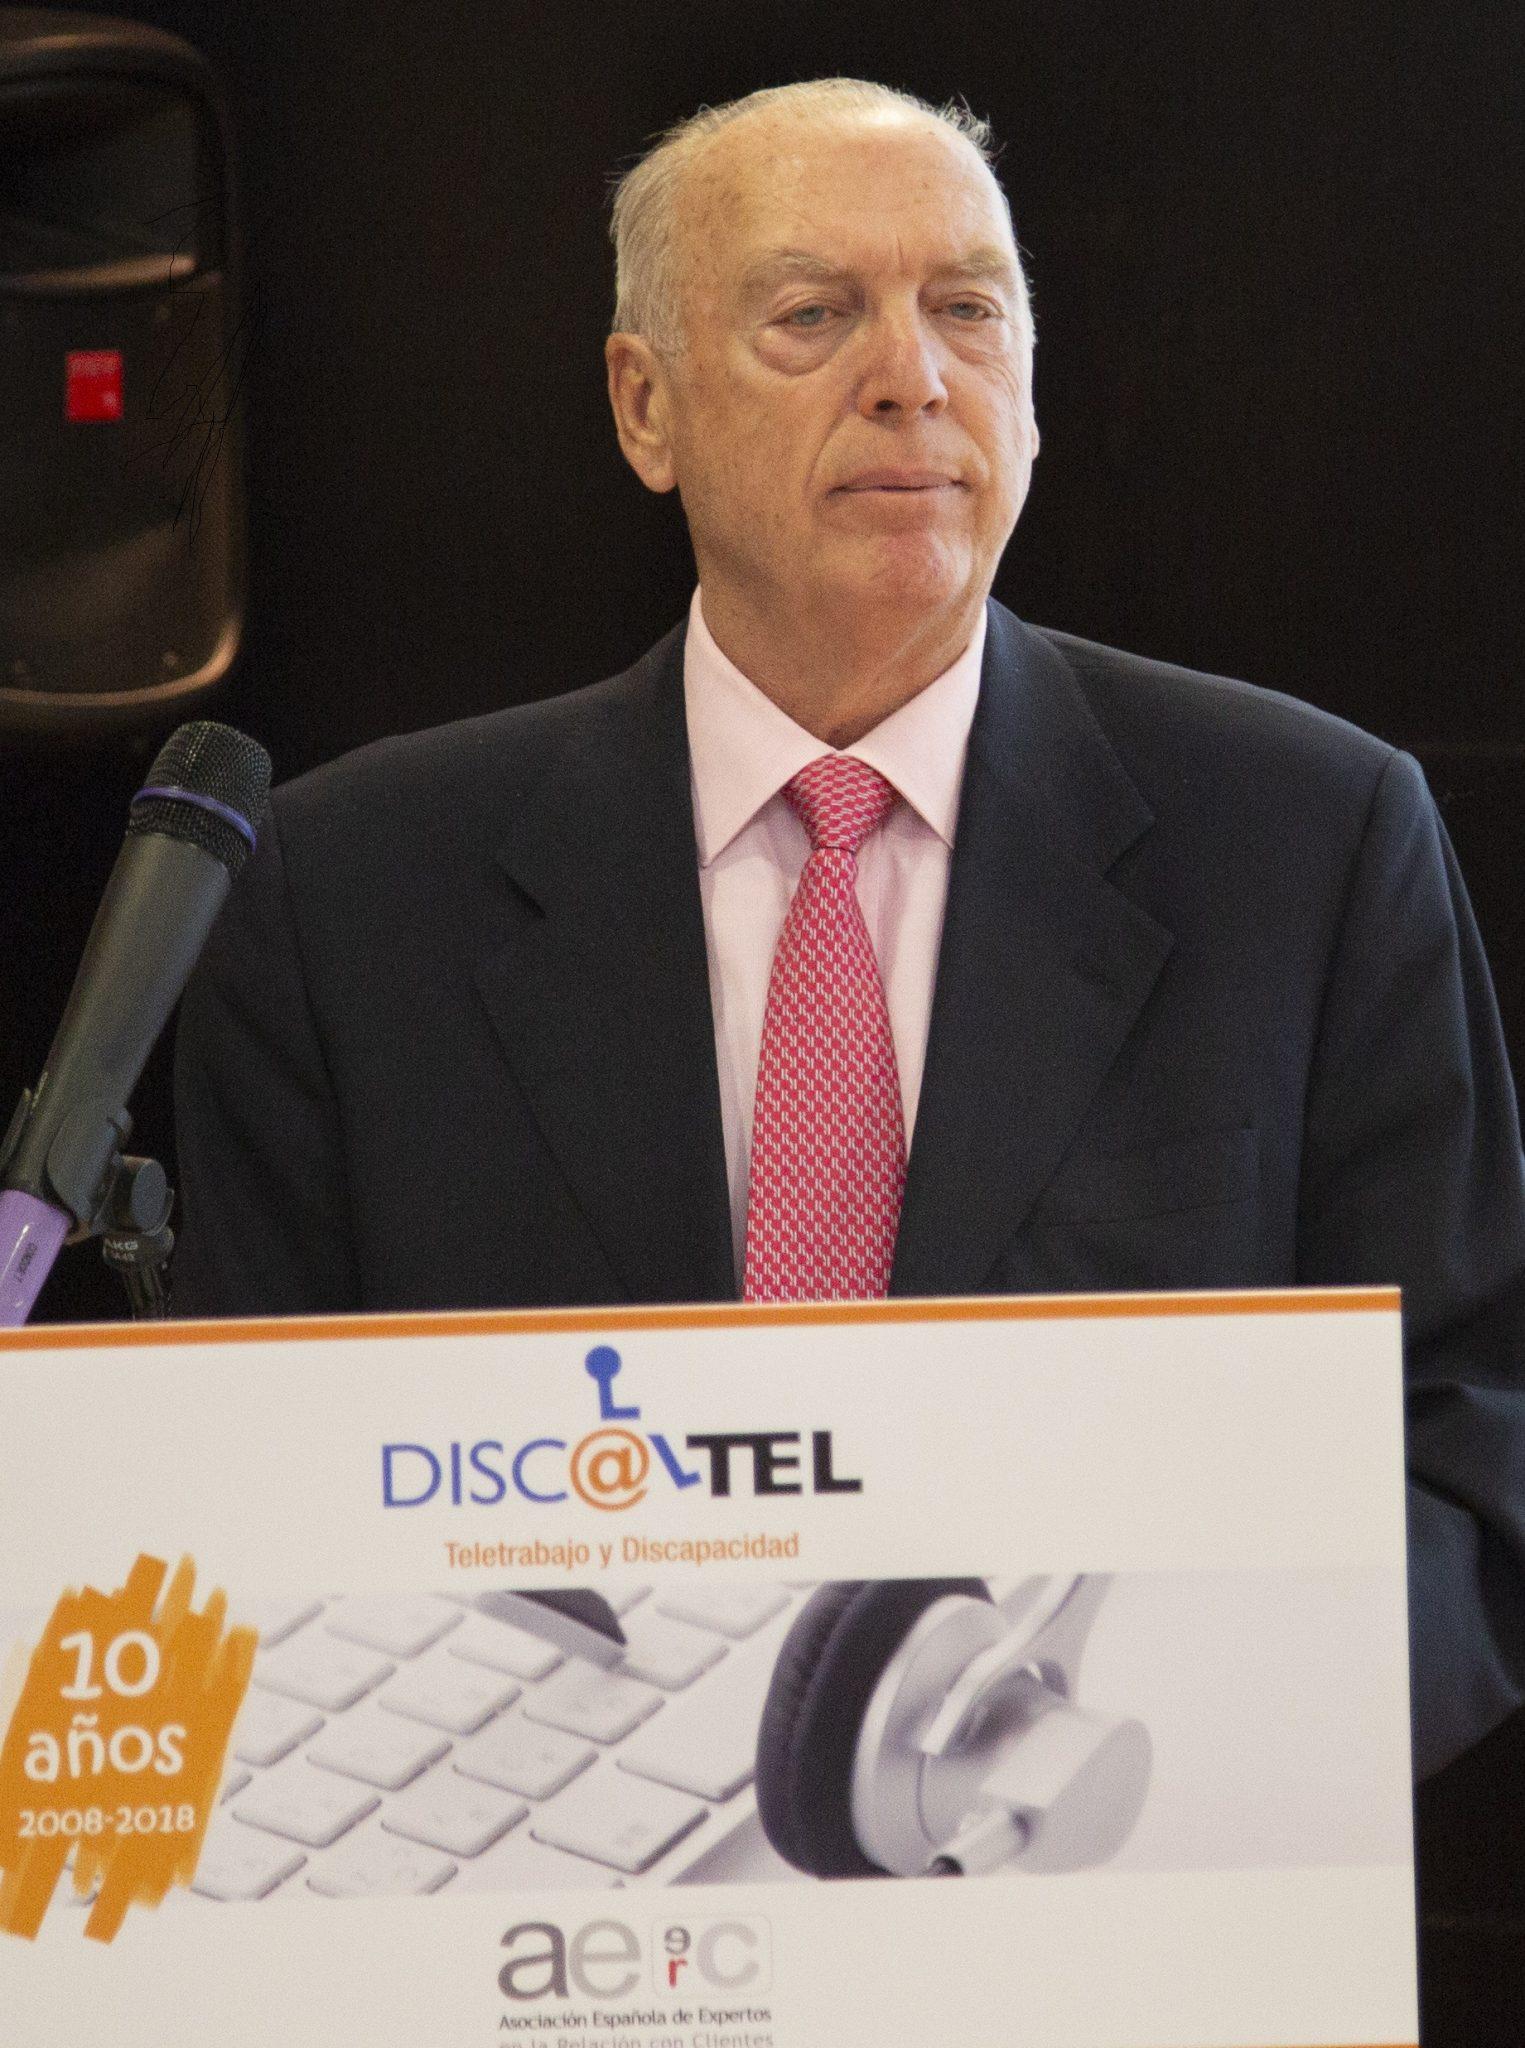 Jose Luis Goytre